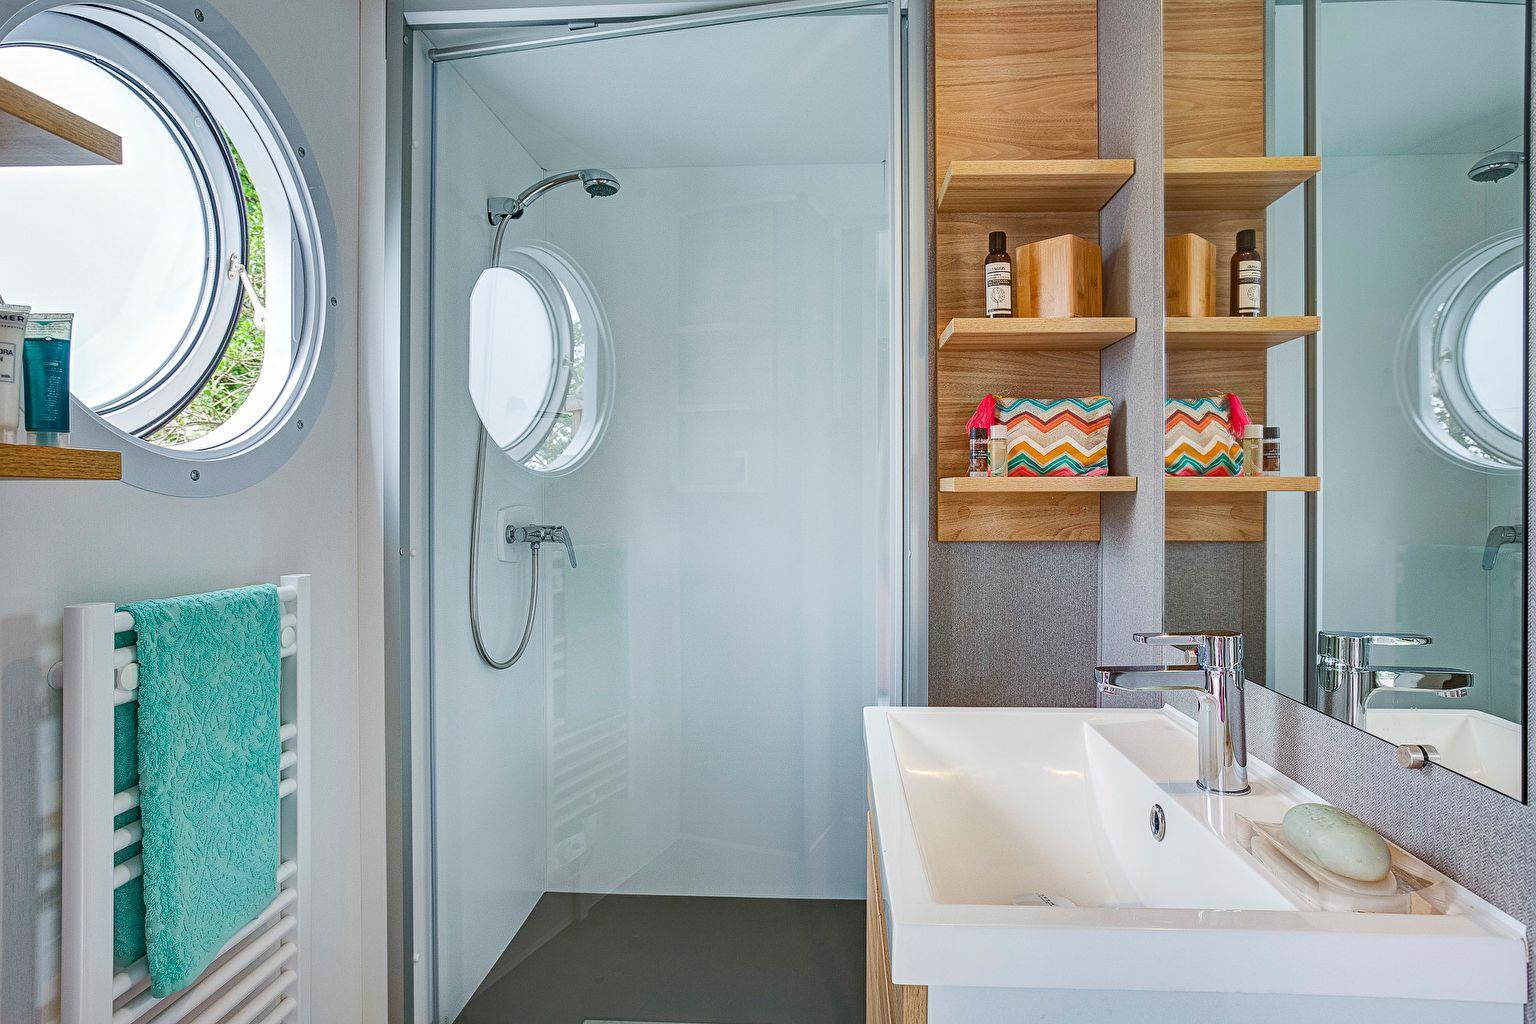 Location - Cottage Key West 3 Chambres - Climatisation **** - Camping Sandaya Les Alicourts Resort